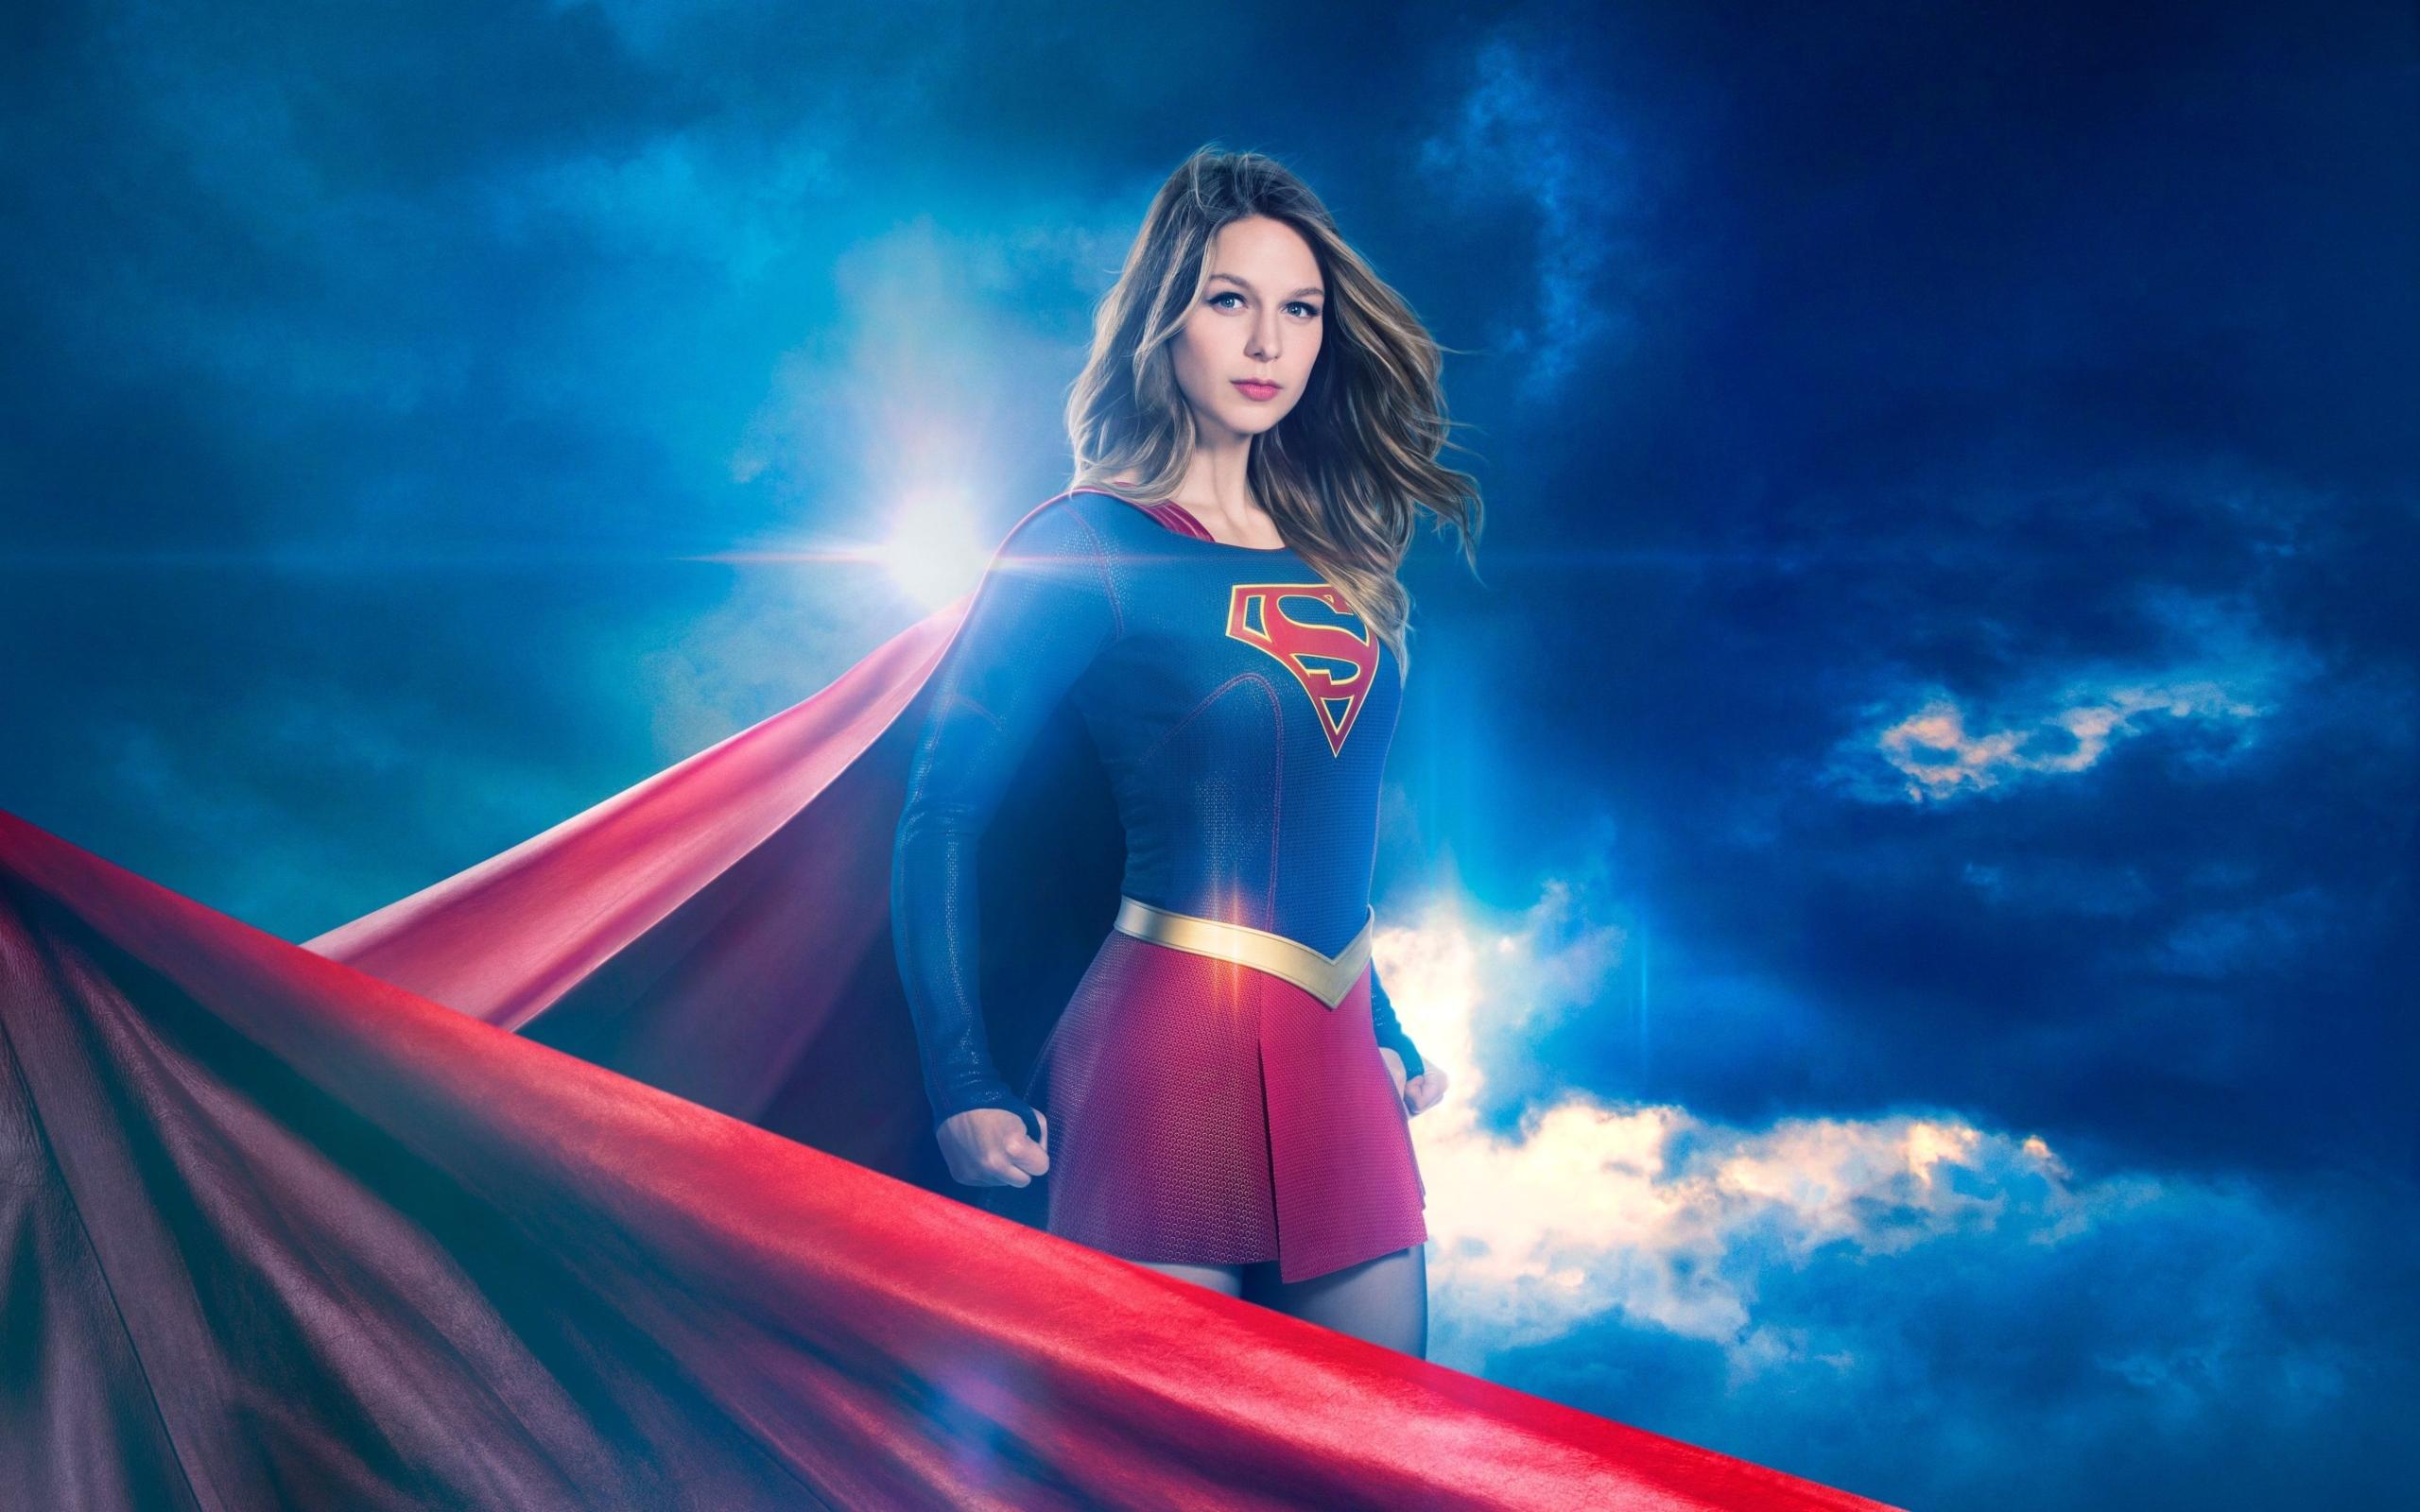 Supergirl wallpaper Picture designs ideas